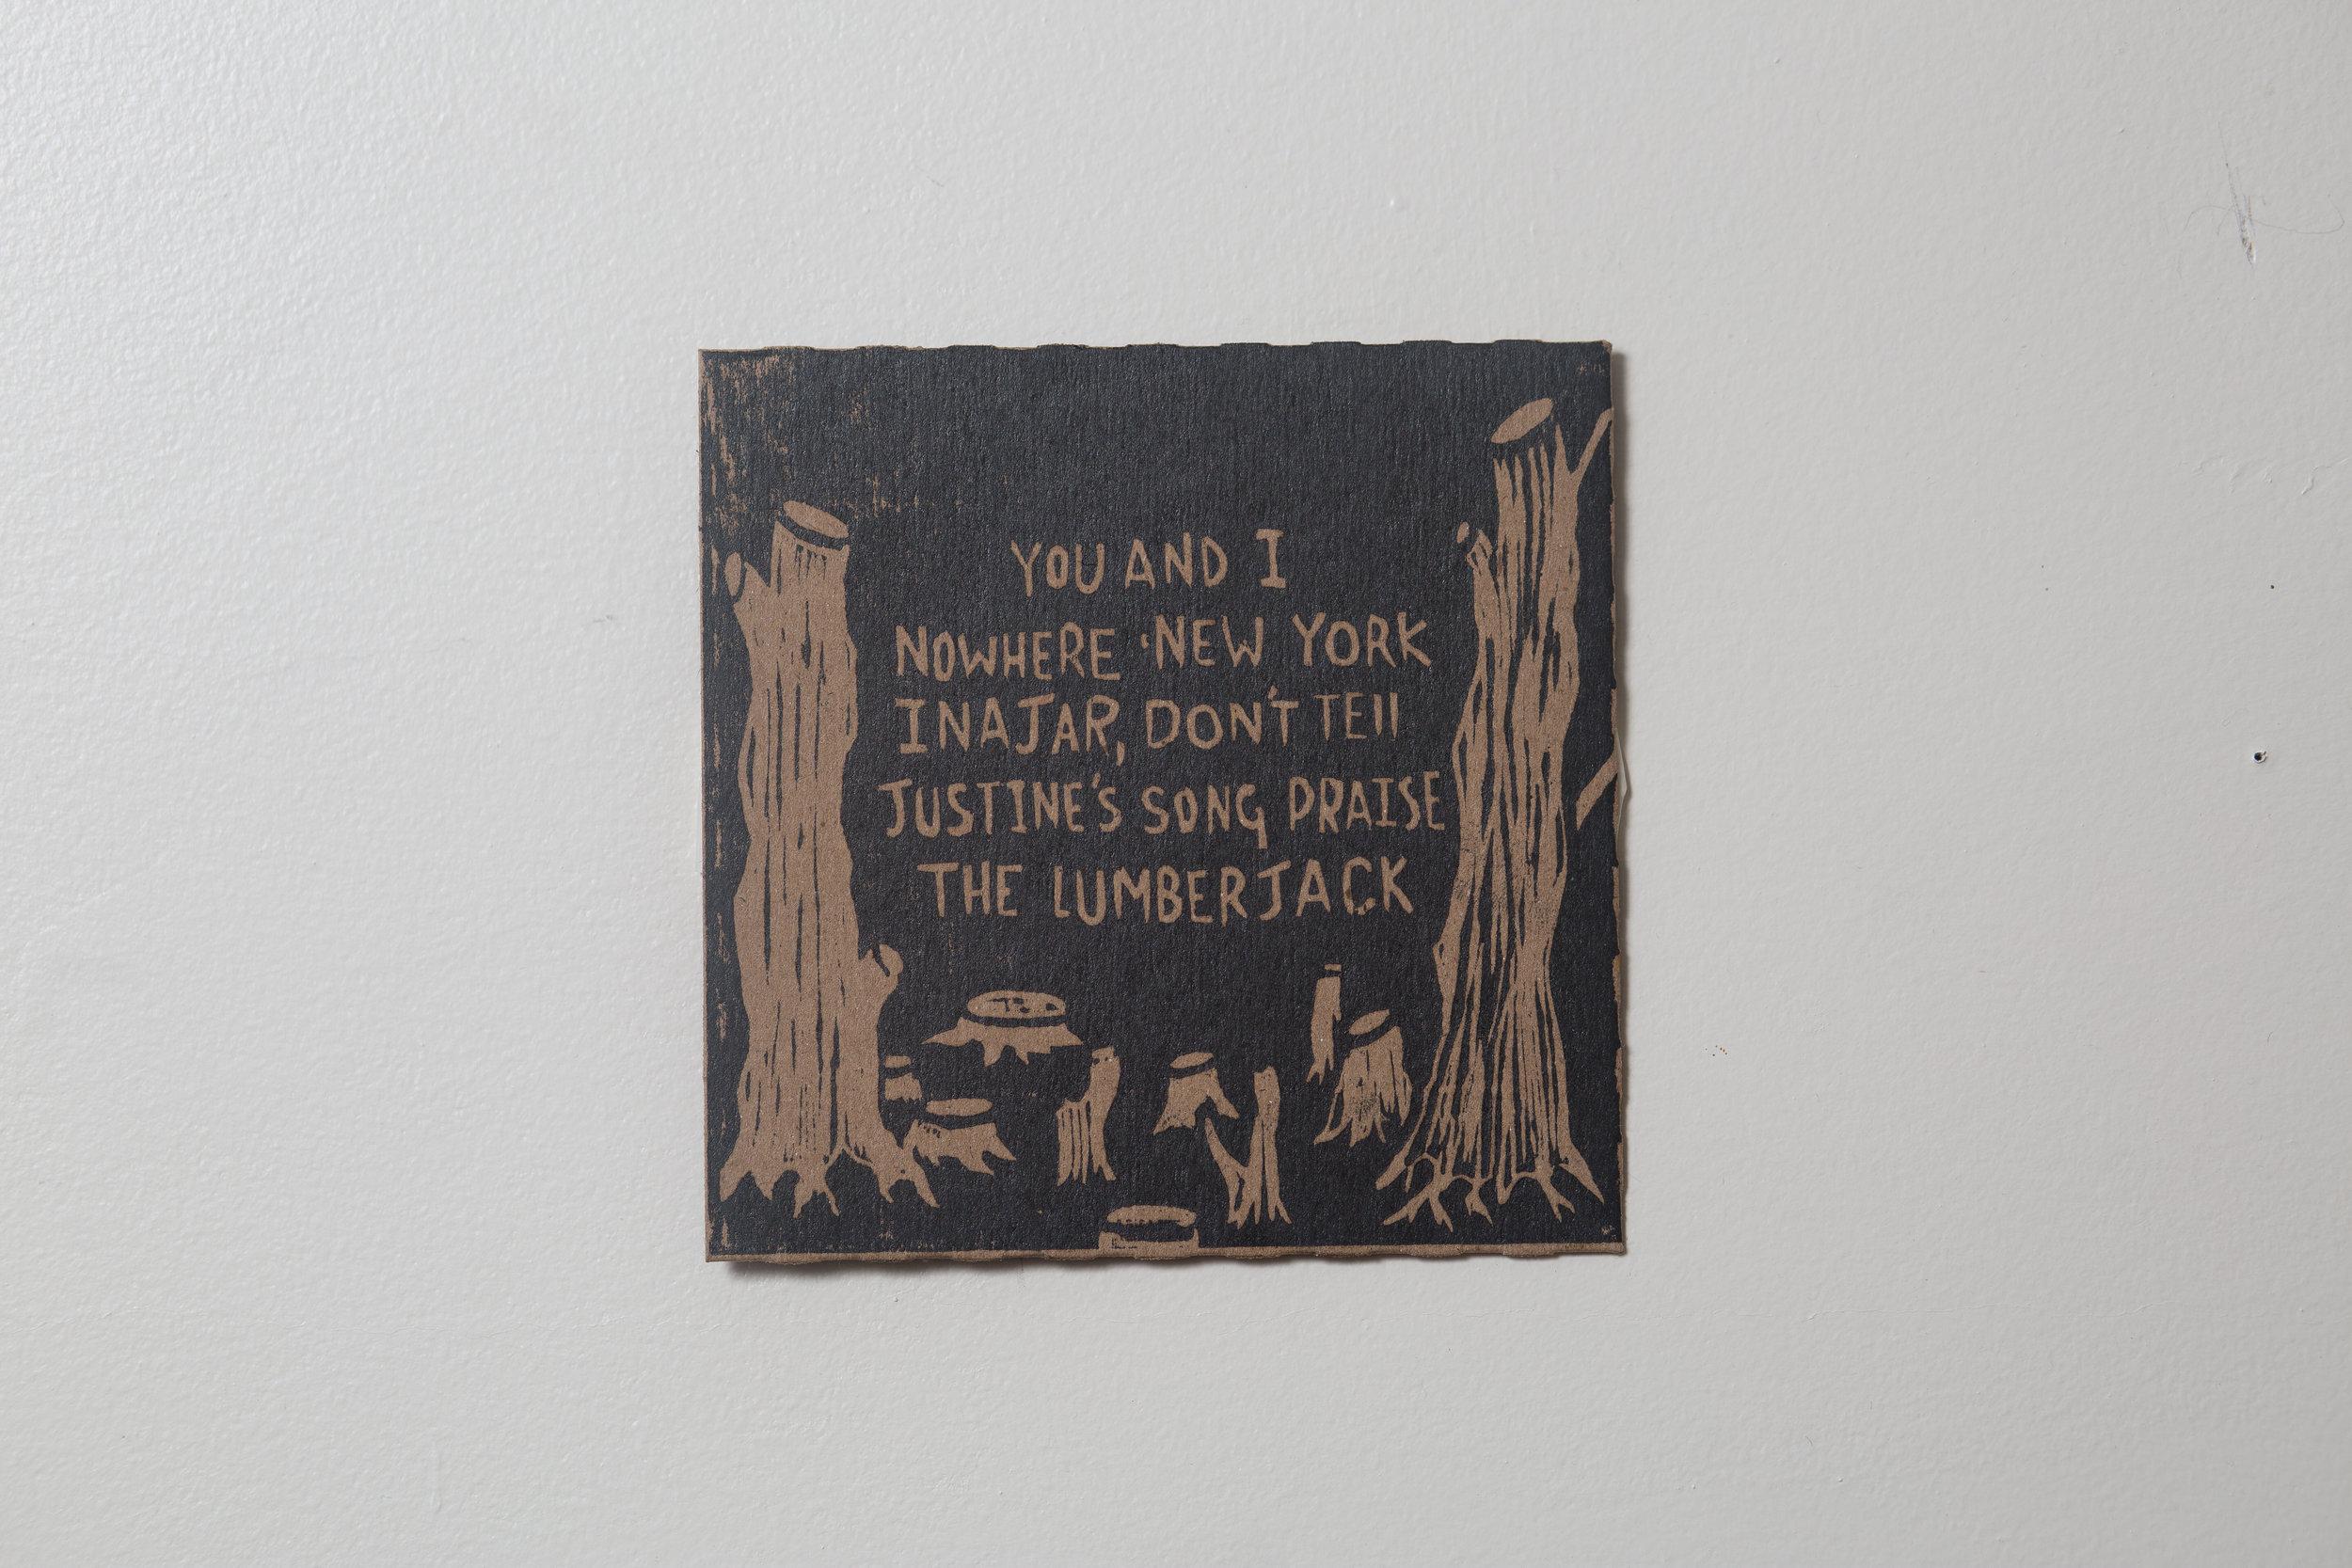 'The Lumberjack' CD front